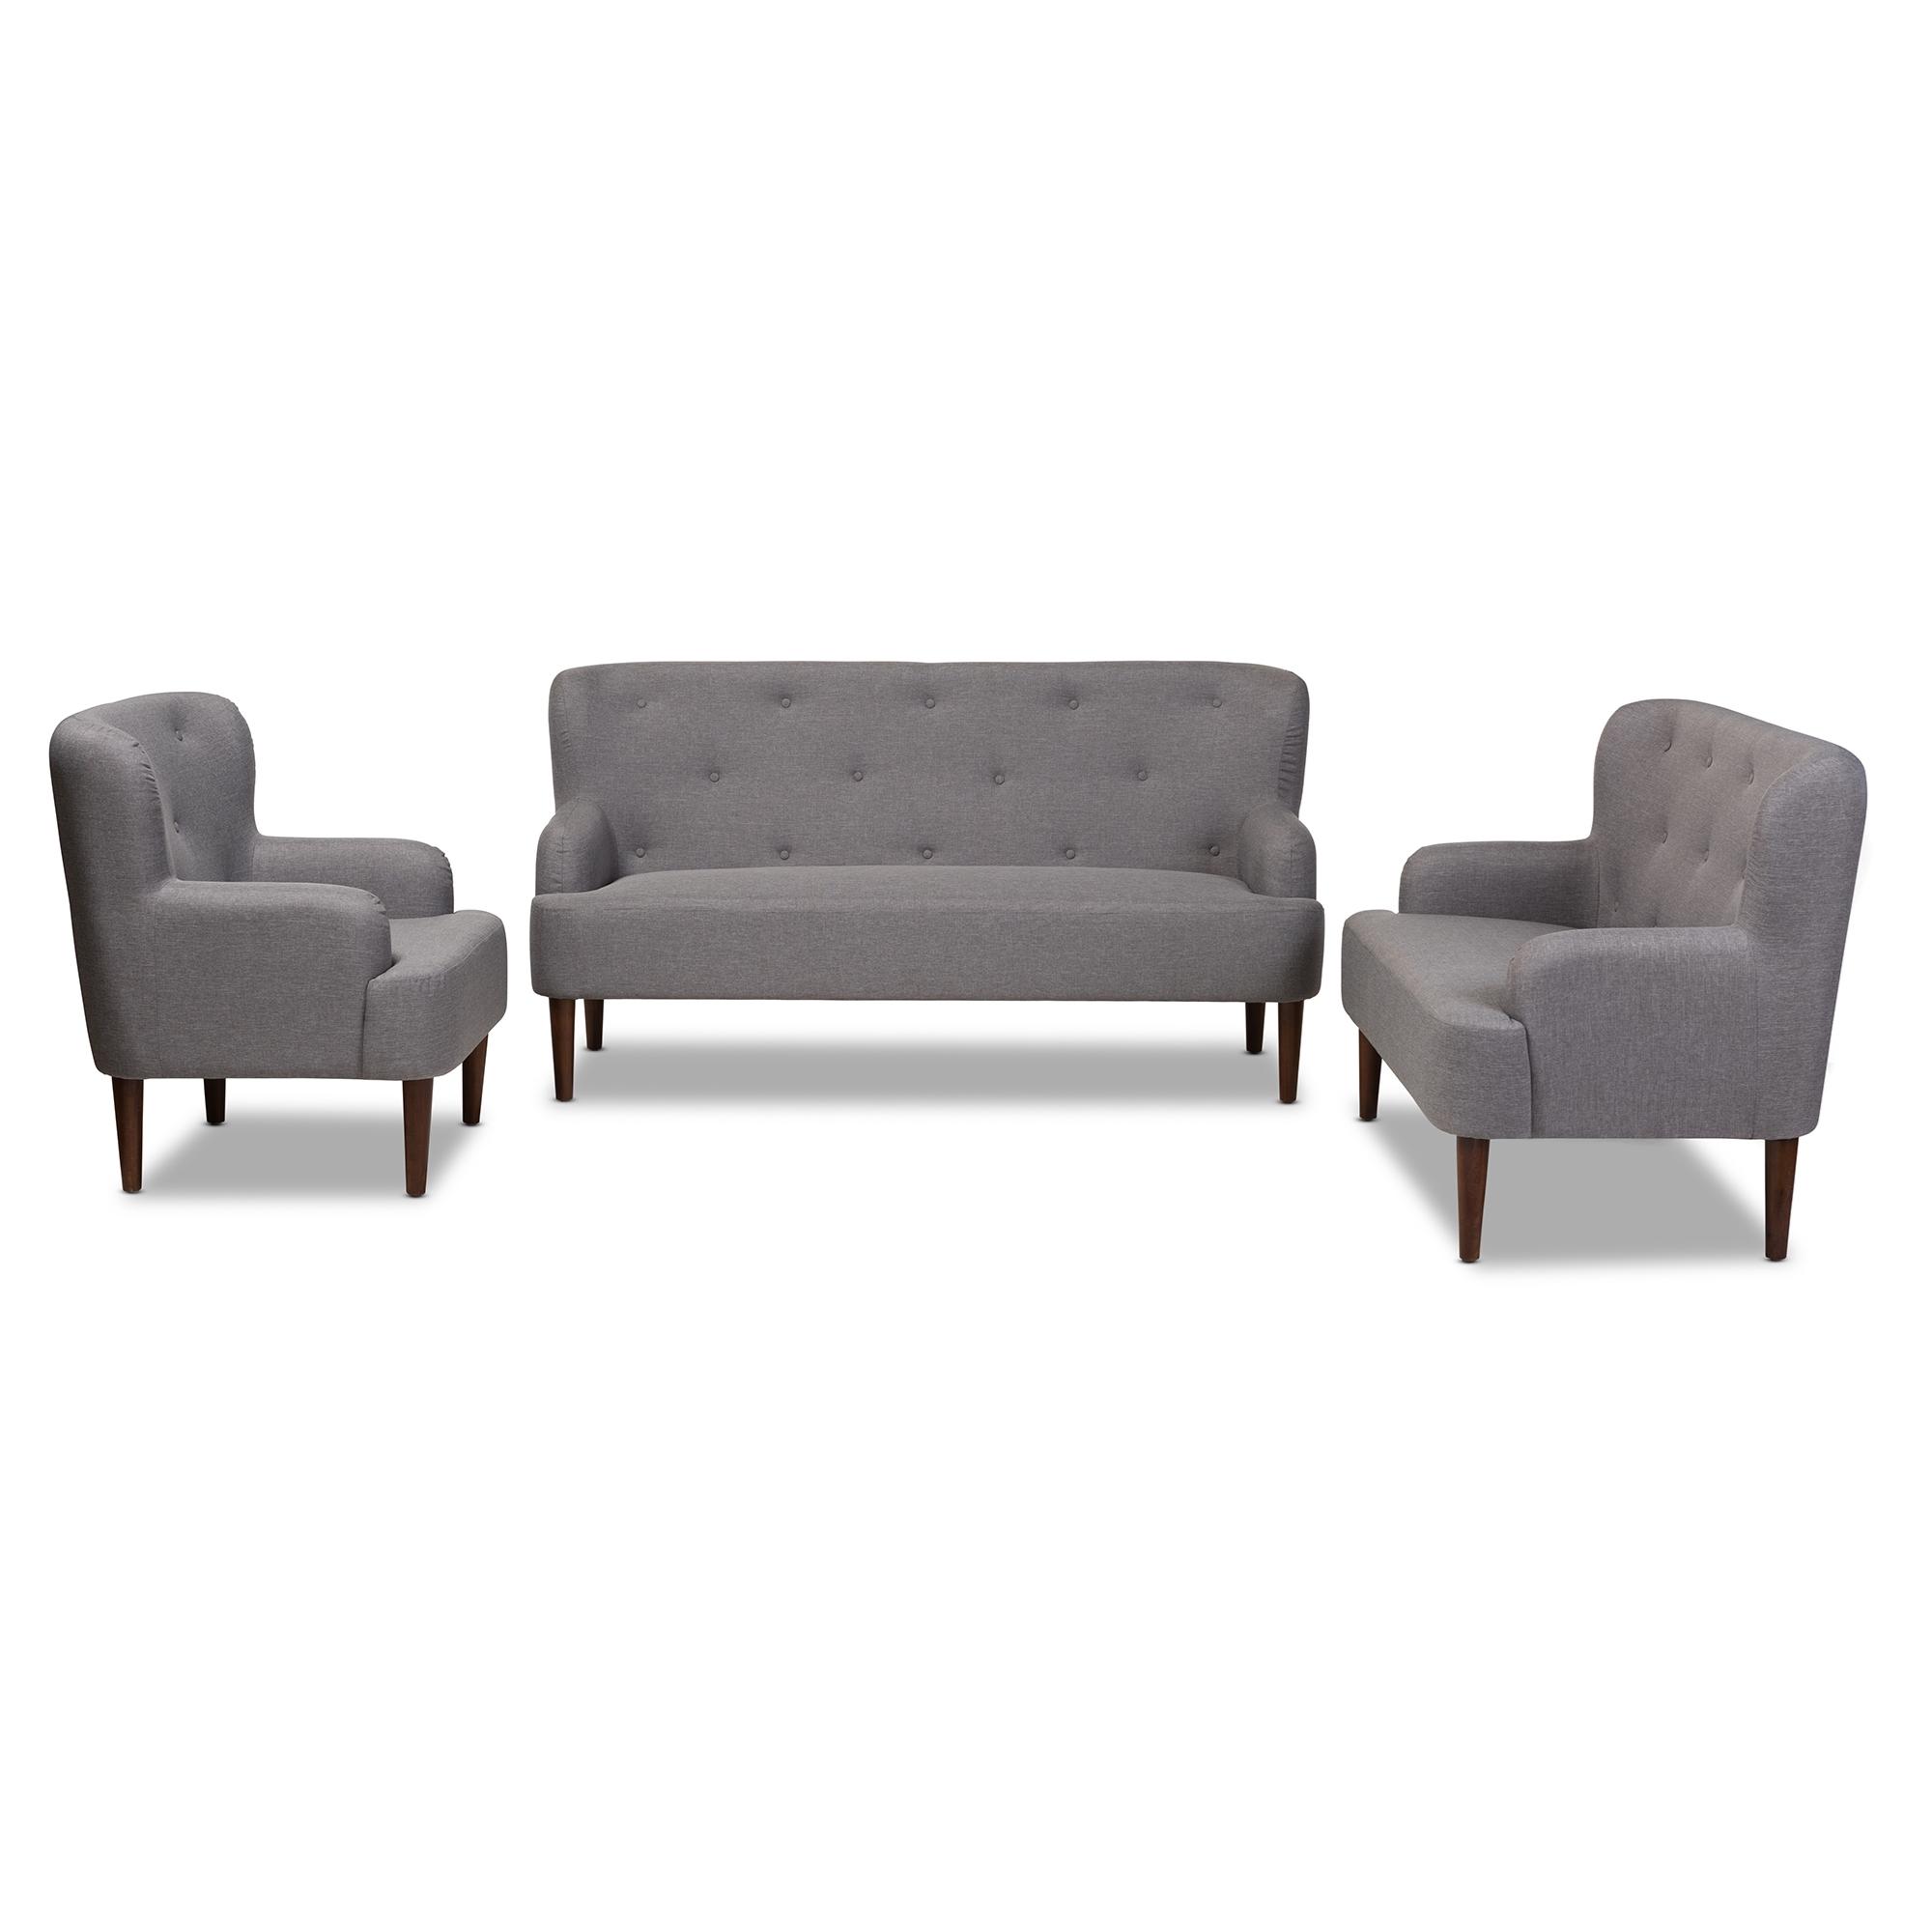 Wholesale sofa set Wholesale living room furniture  : 808 Light Grey 3PC Set 1 from www.wholesale-interiors.com size 1000 x 1000 jpeg 149kB